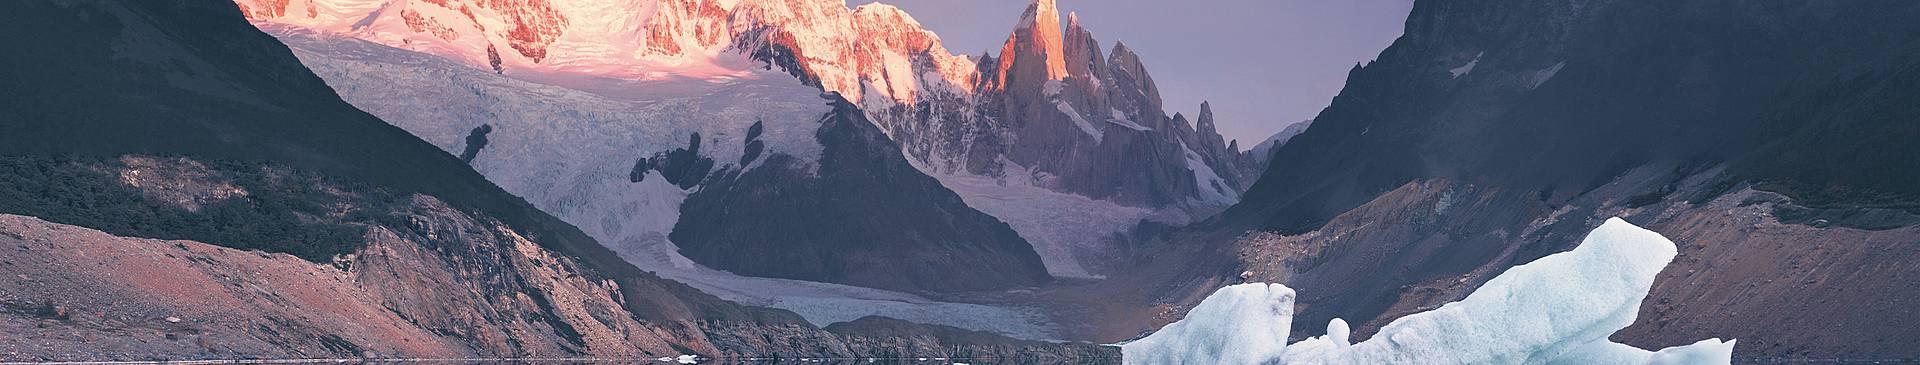 Argentina in December